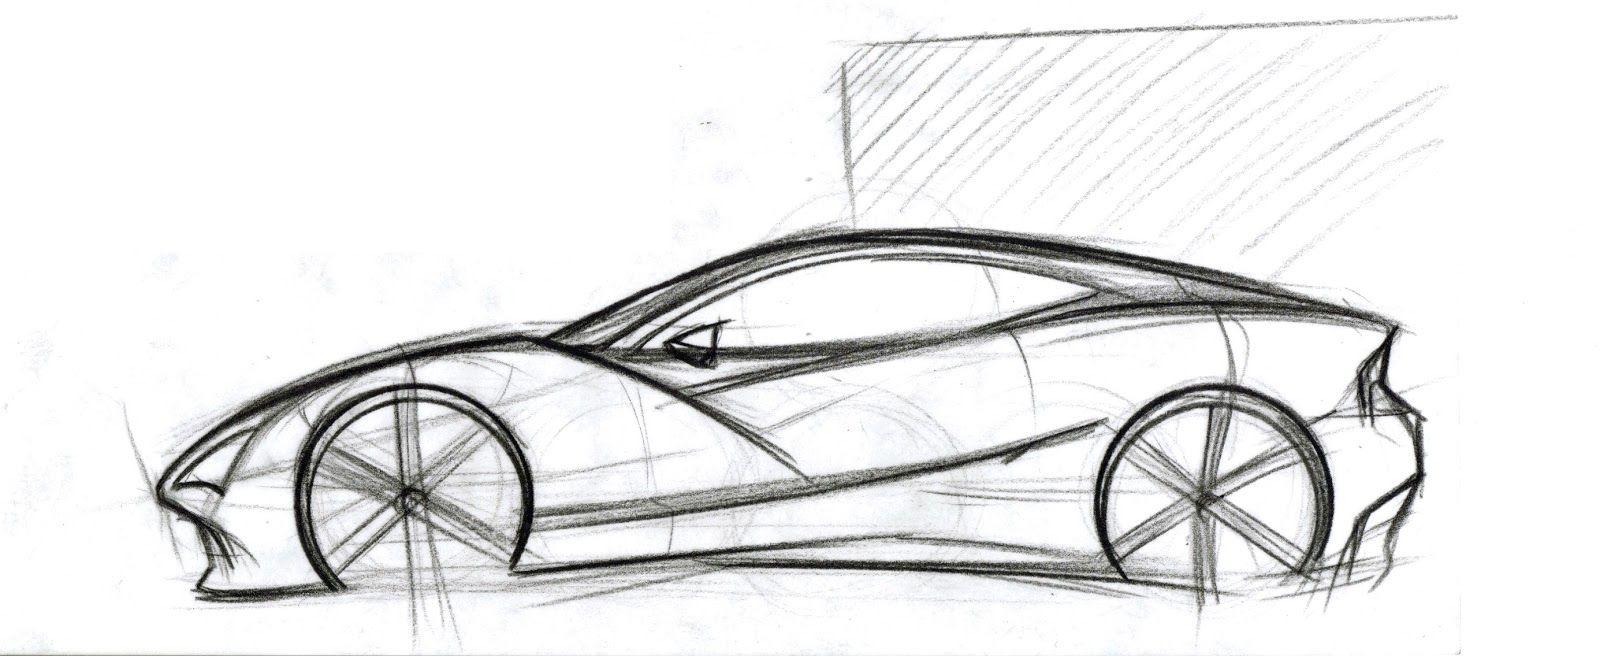 Exelent Car 2d Drawings Model - Electrical Diagram Ideas - piotomar.info